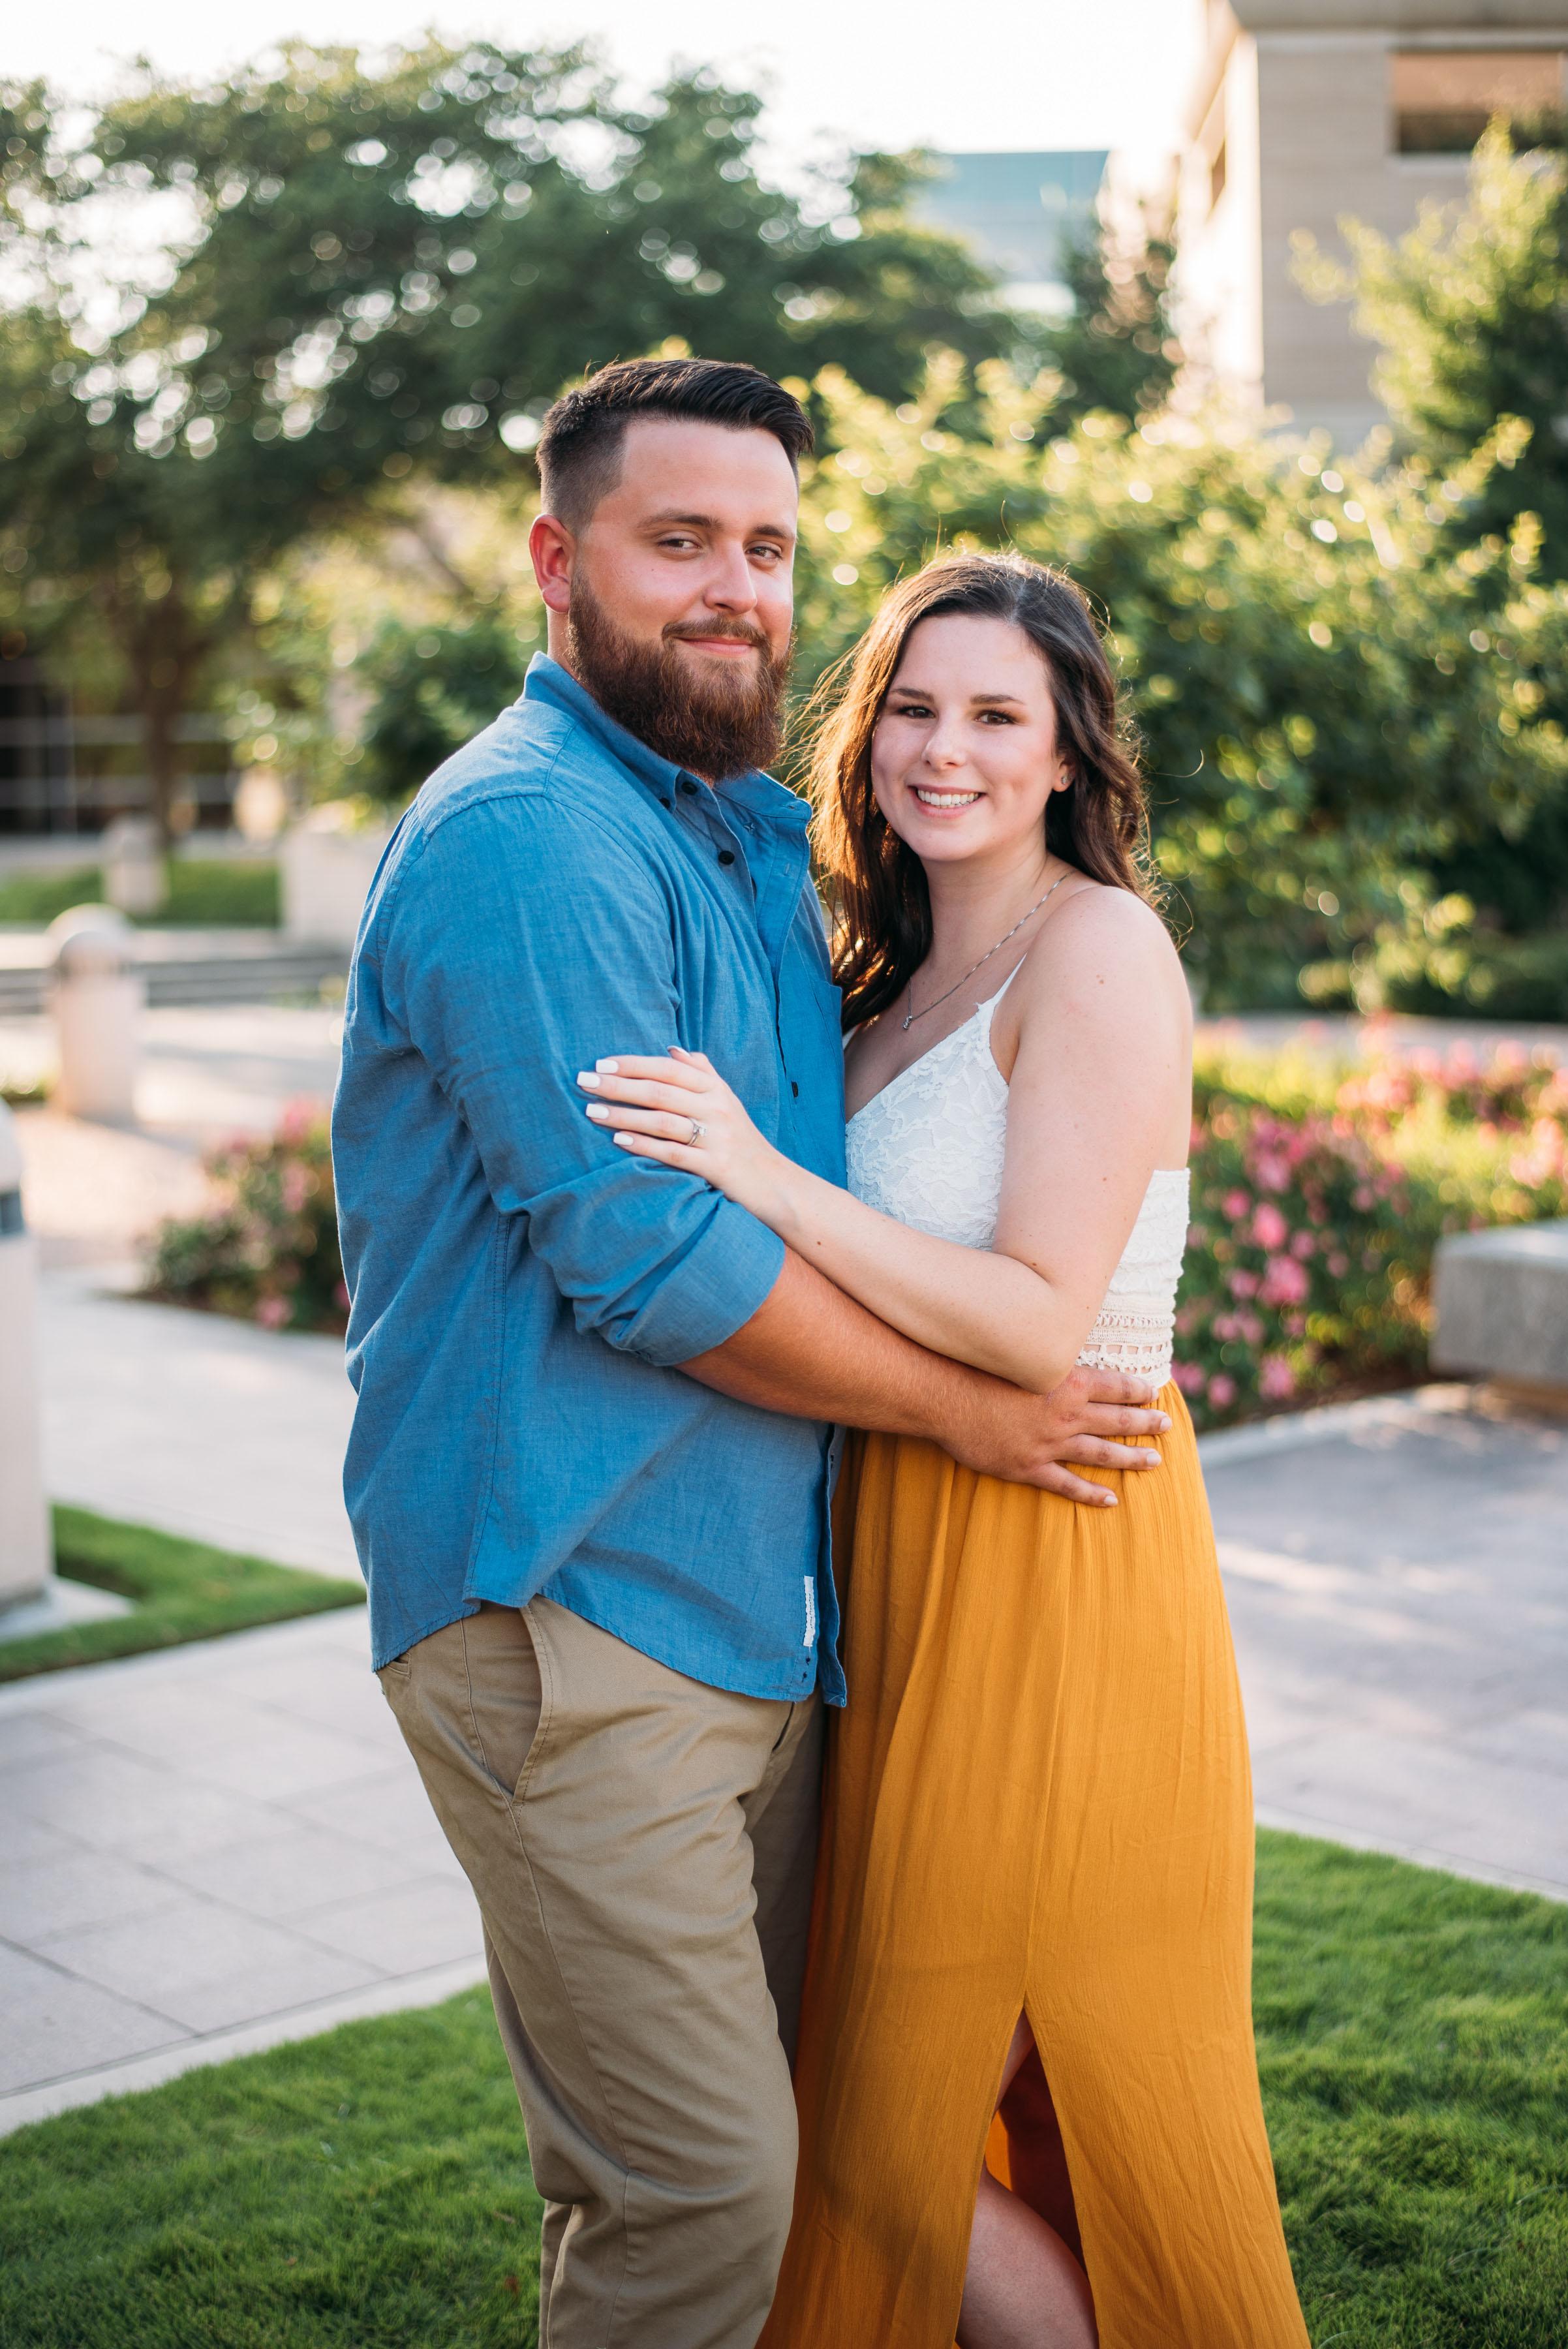 George-Bush-Library-Texas-A&M-University-Engagement-College-Station-Wedding-Photographer-San-Angel-Photo-Mark-Jenna-Matt-Century-Tree-19.jpg